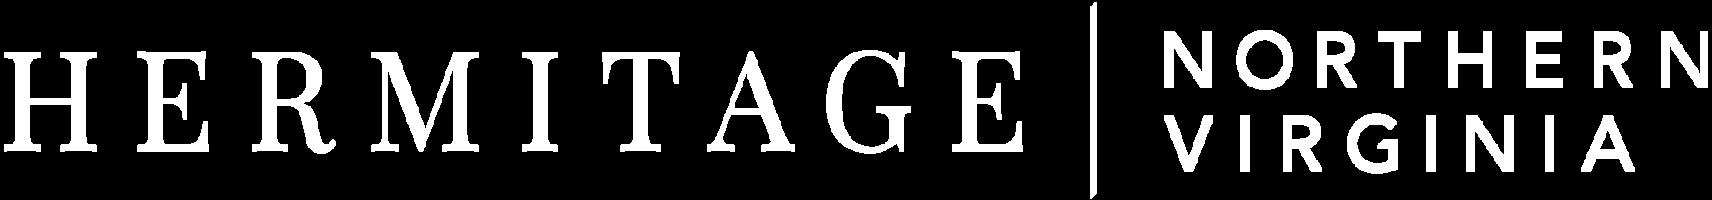 Hermitage Northern Virginia Logo